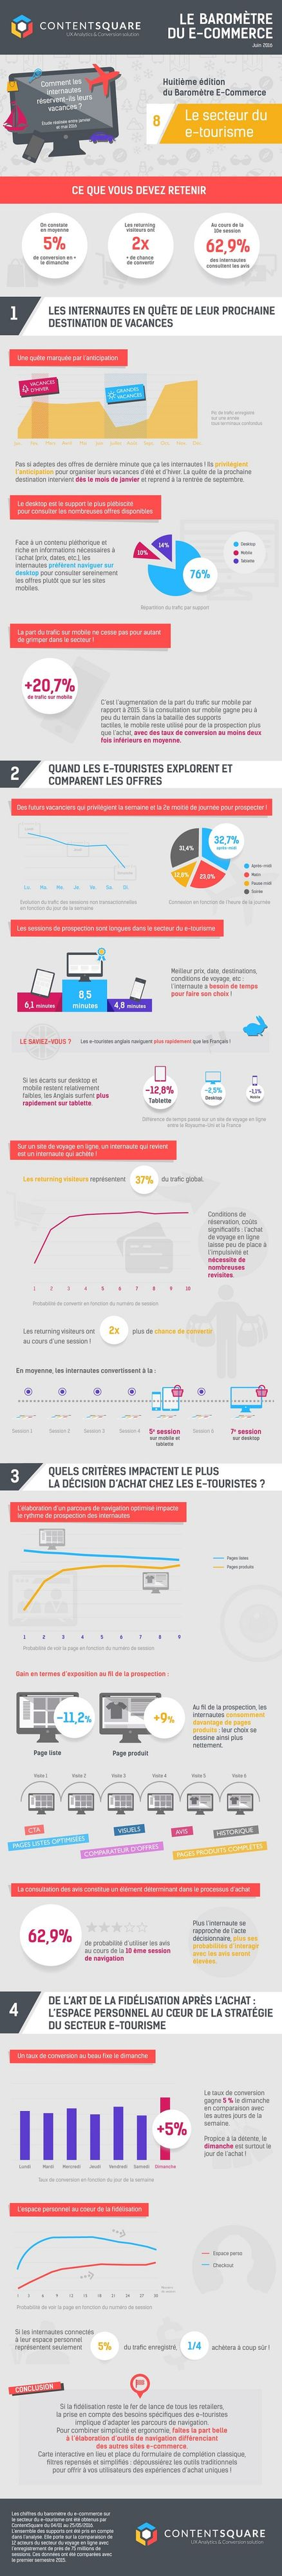 ContentSquare-Infographie